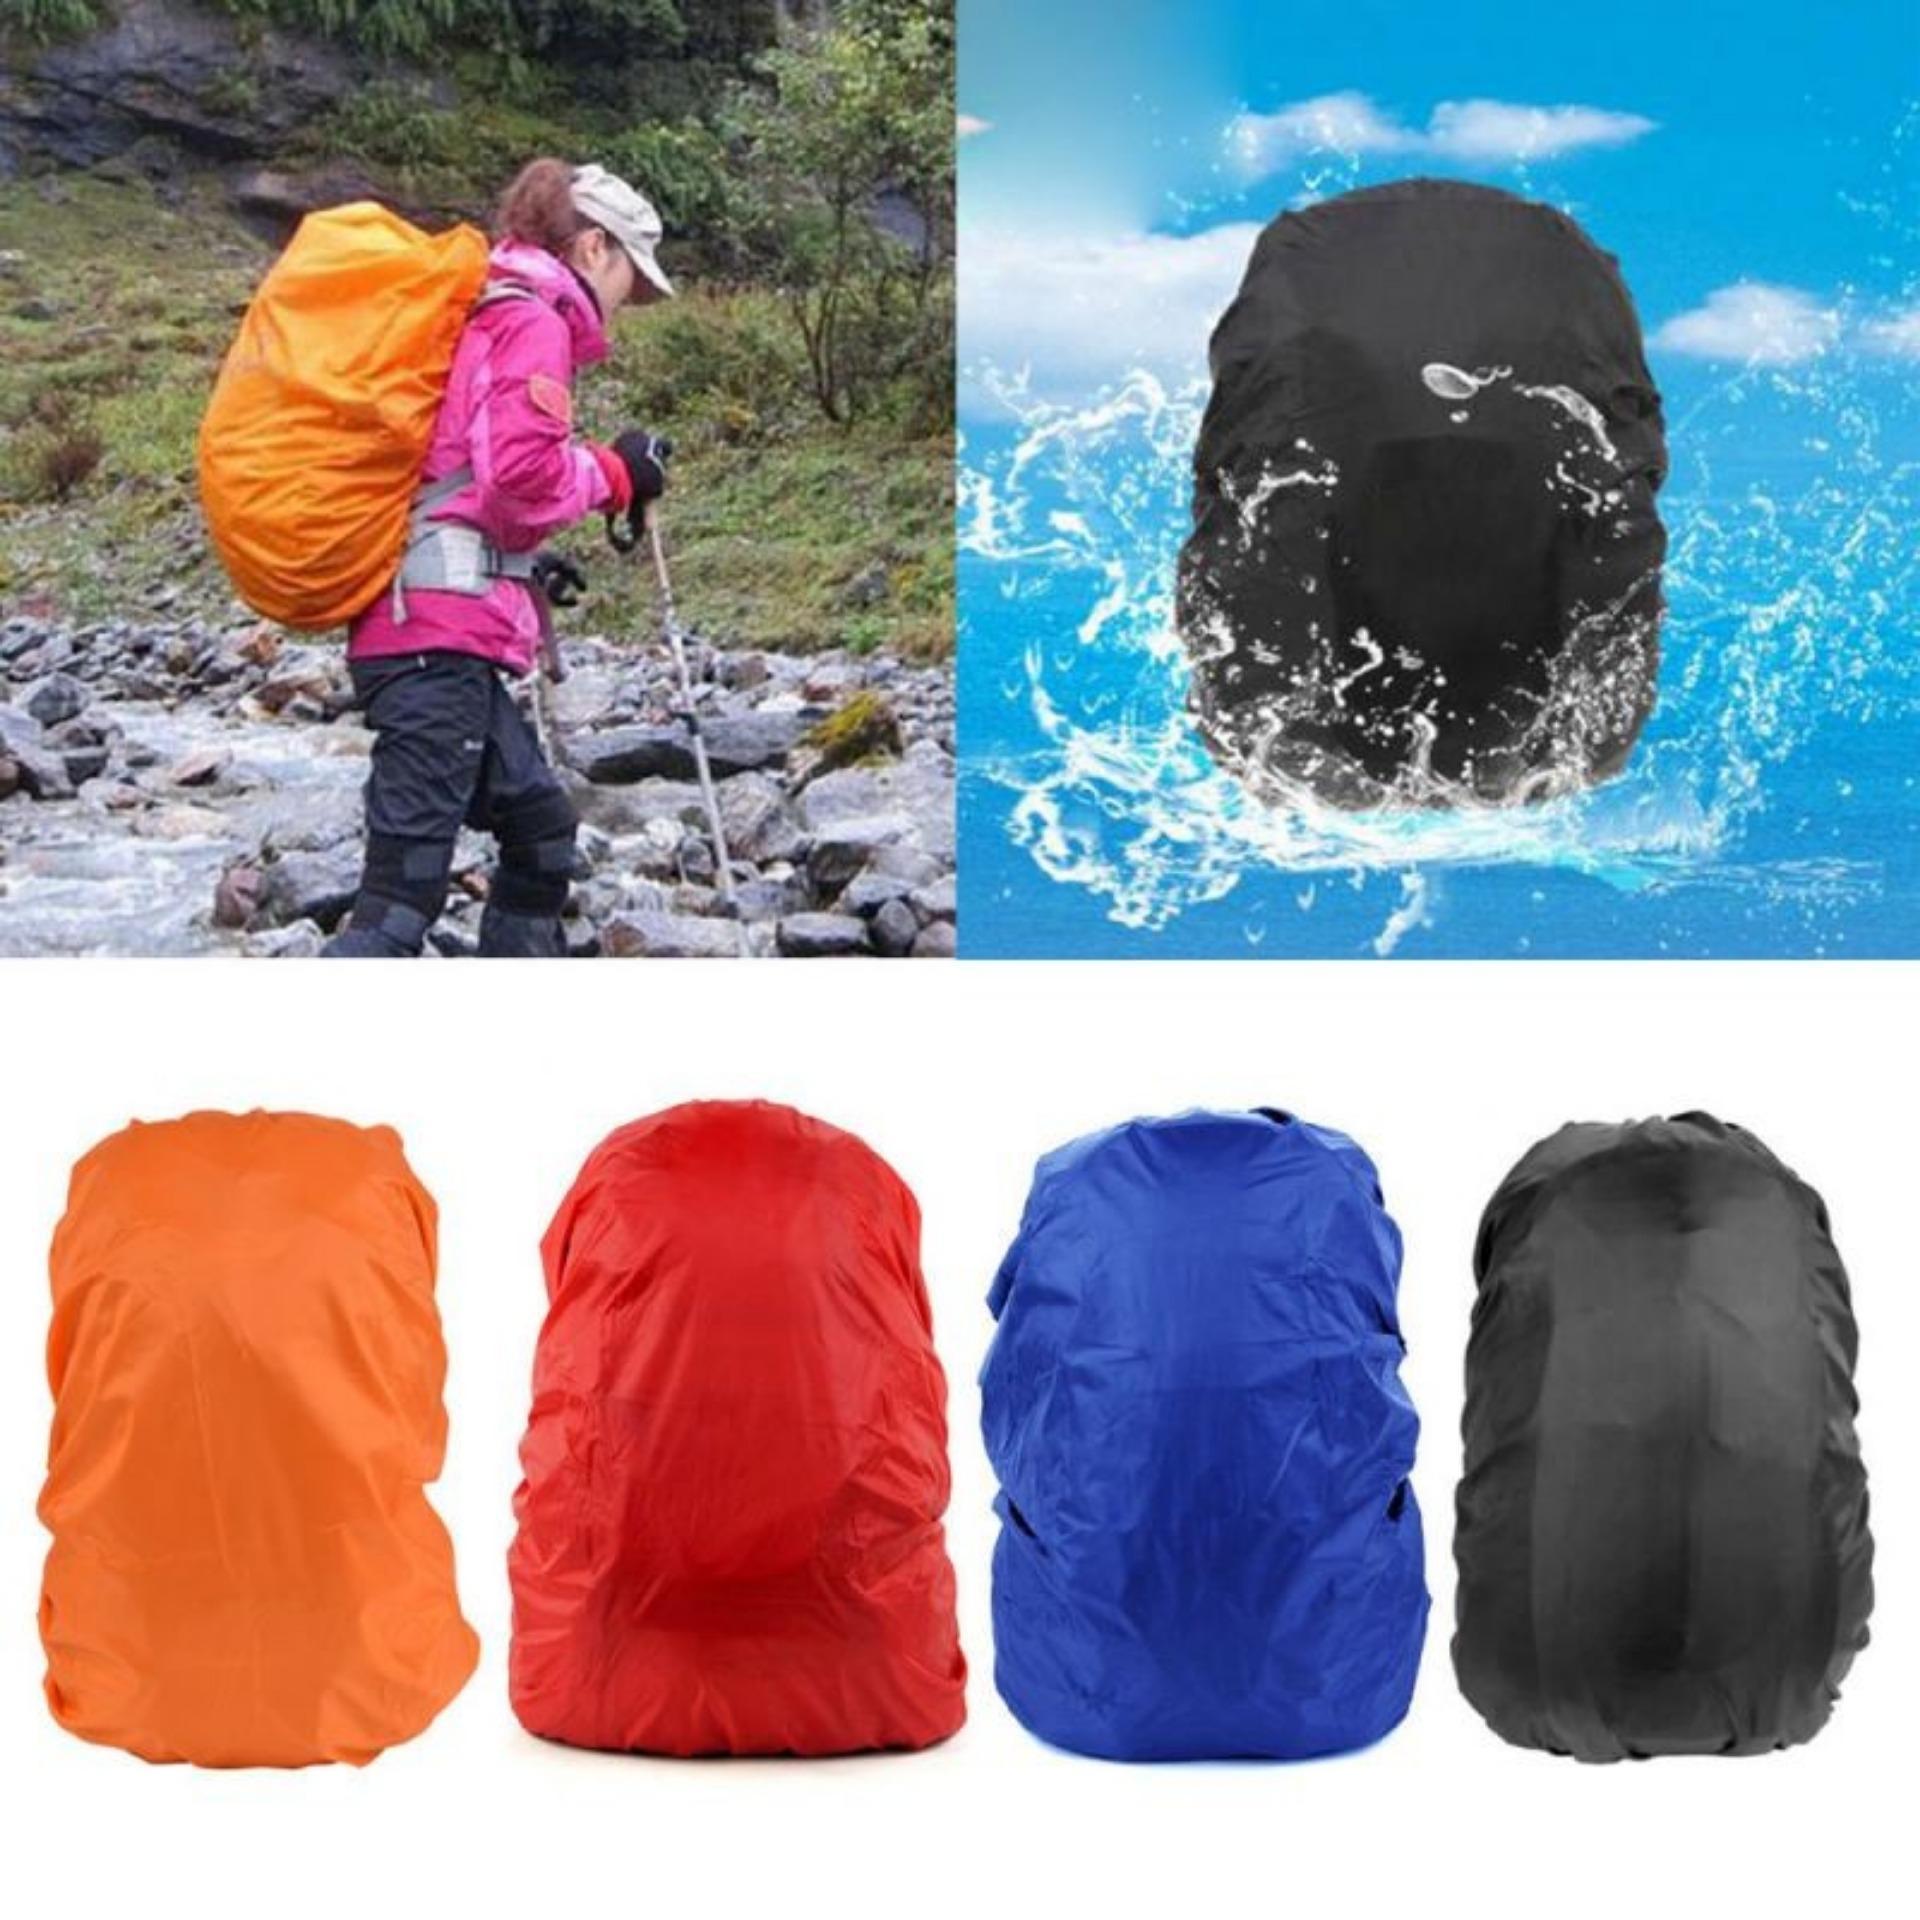 3m Nexcare Rain Coat Sarung Helm Anti Air Jas Hujan Free Masker Source · El Sarung